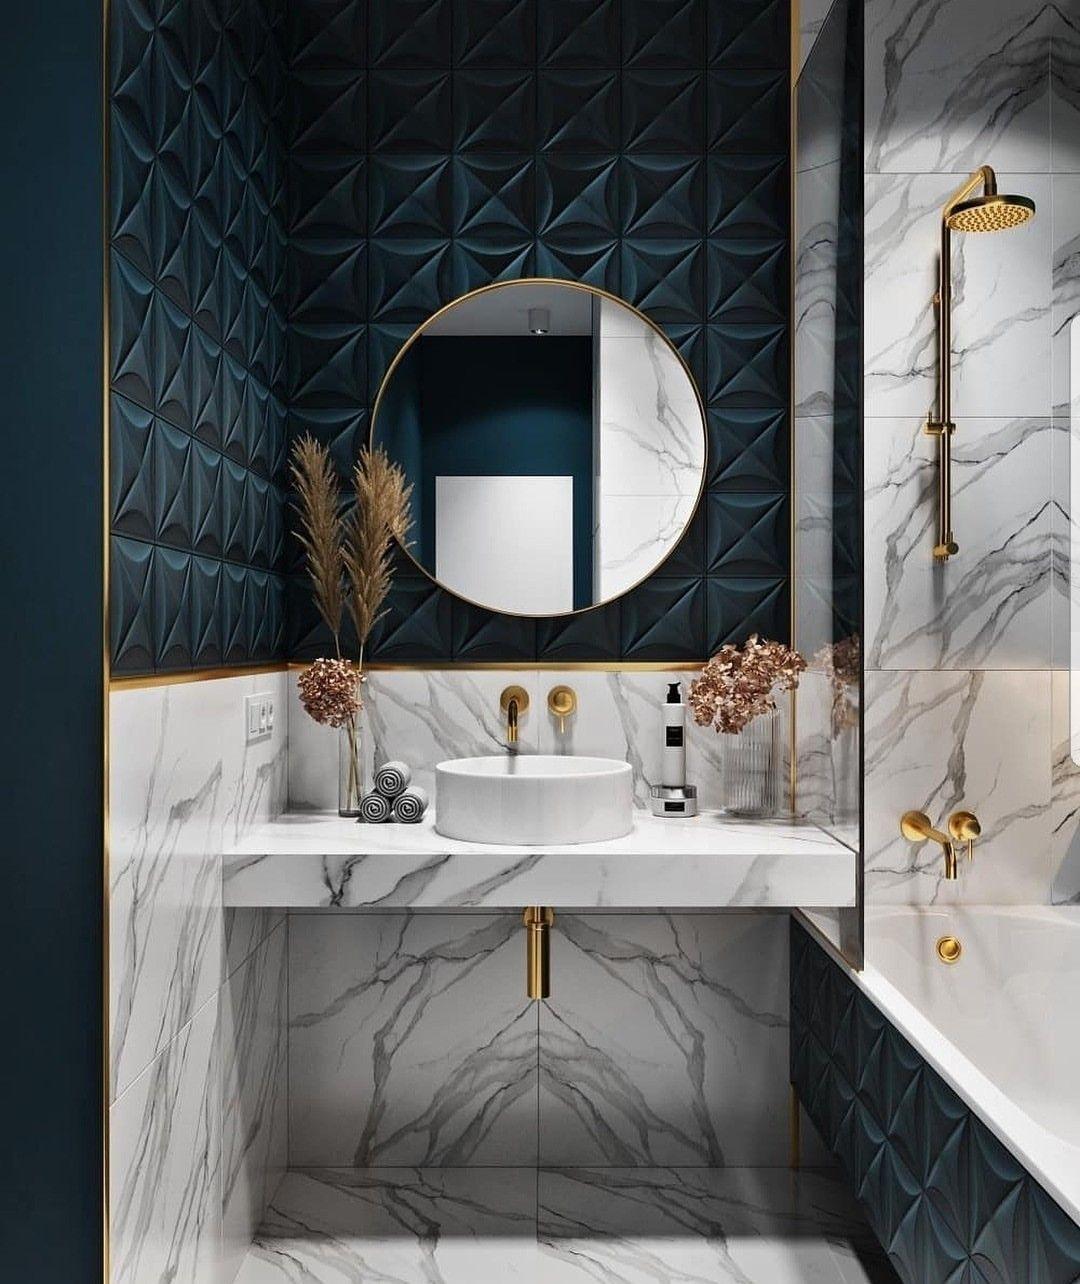 Creative Tile Ideas To Enhance The Bathroom Bathroom Interior Bathroom Interior Design Bathroom Inspiration